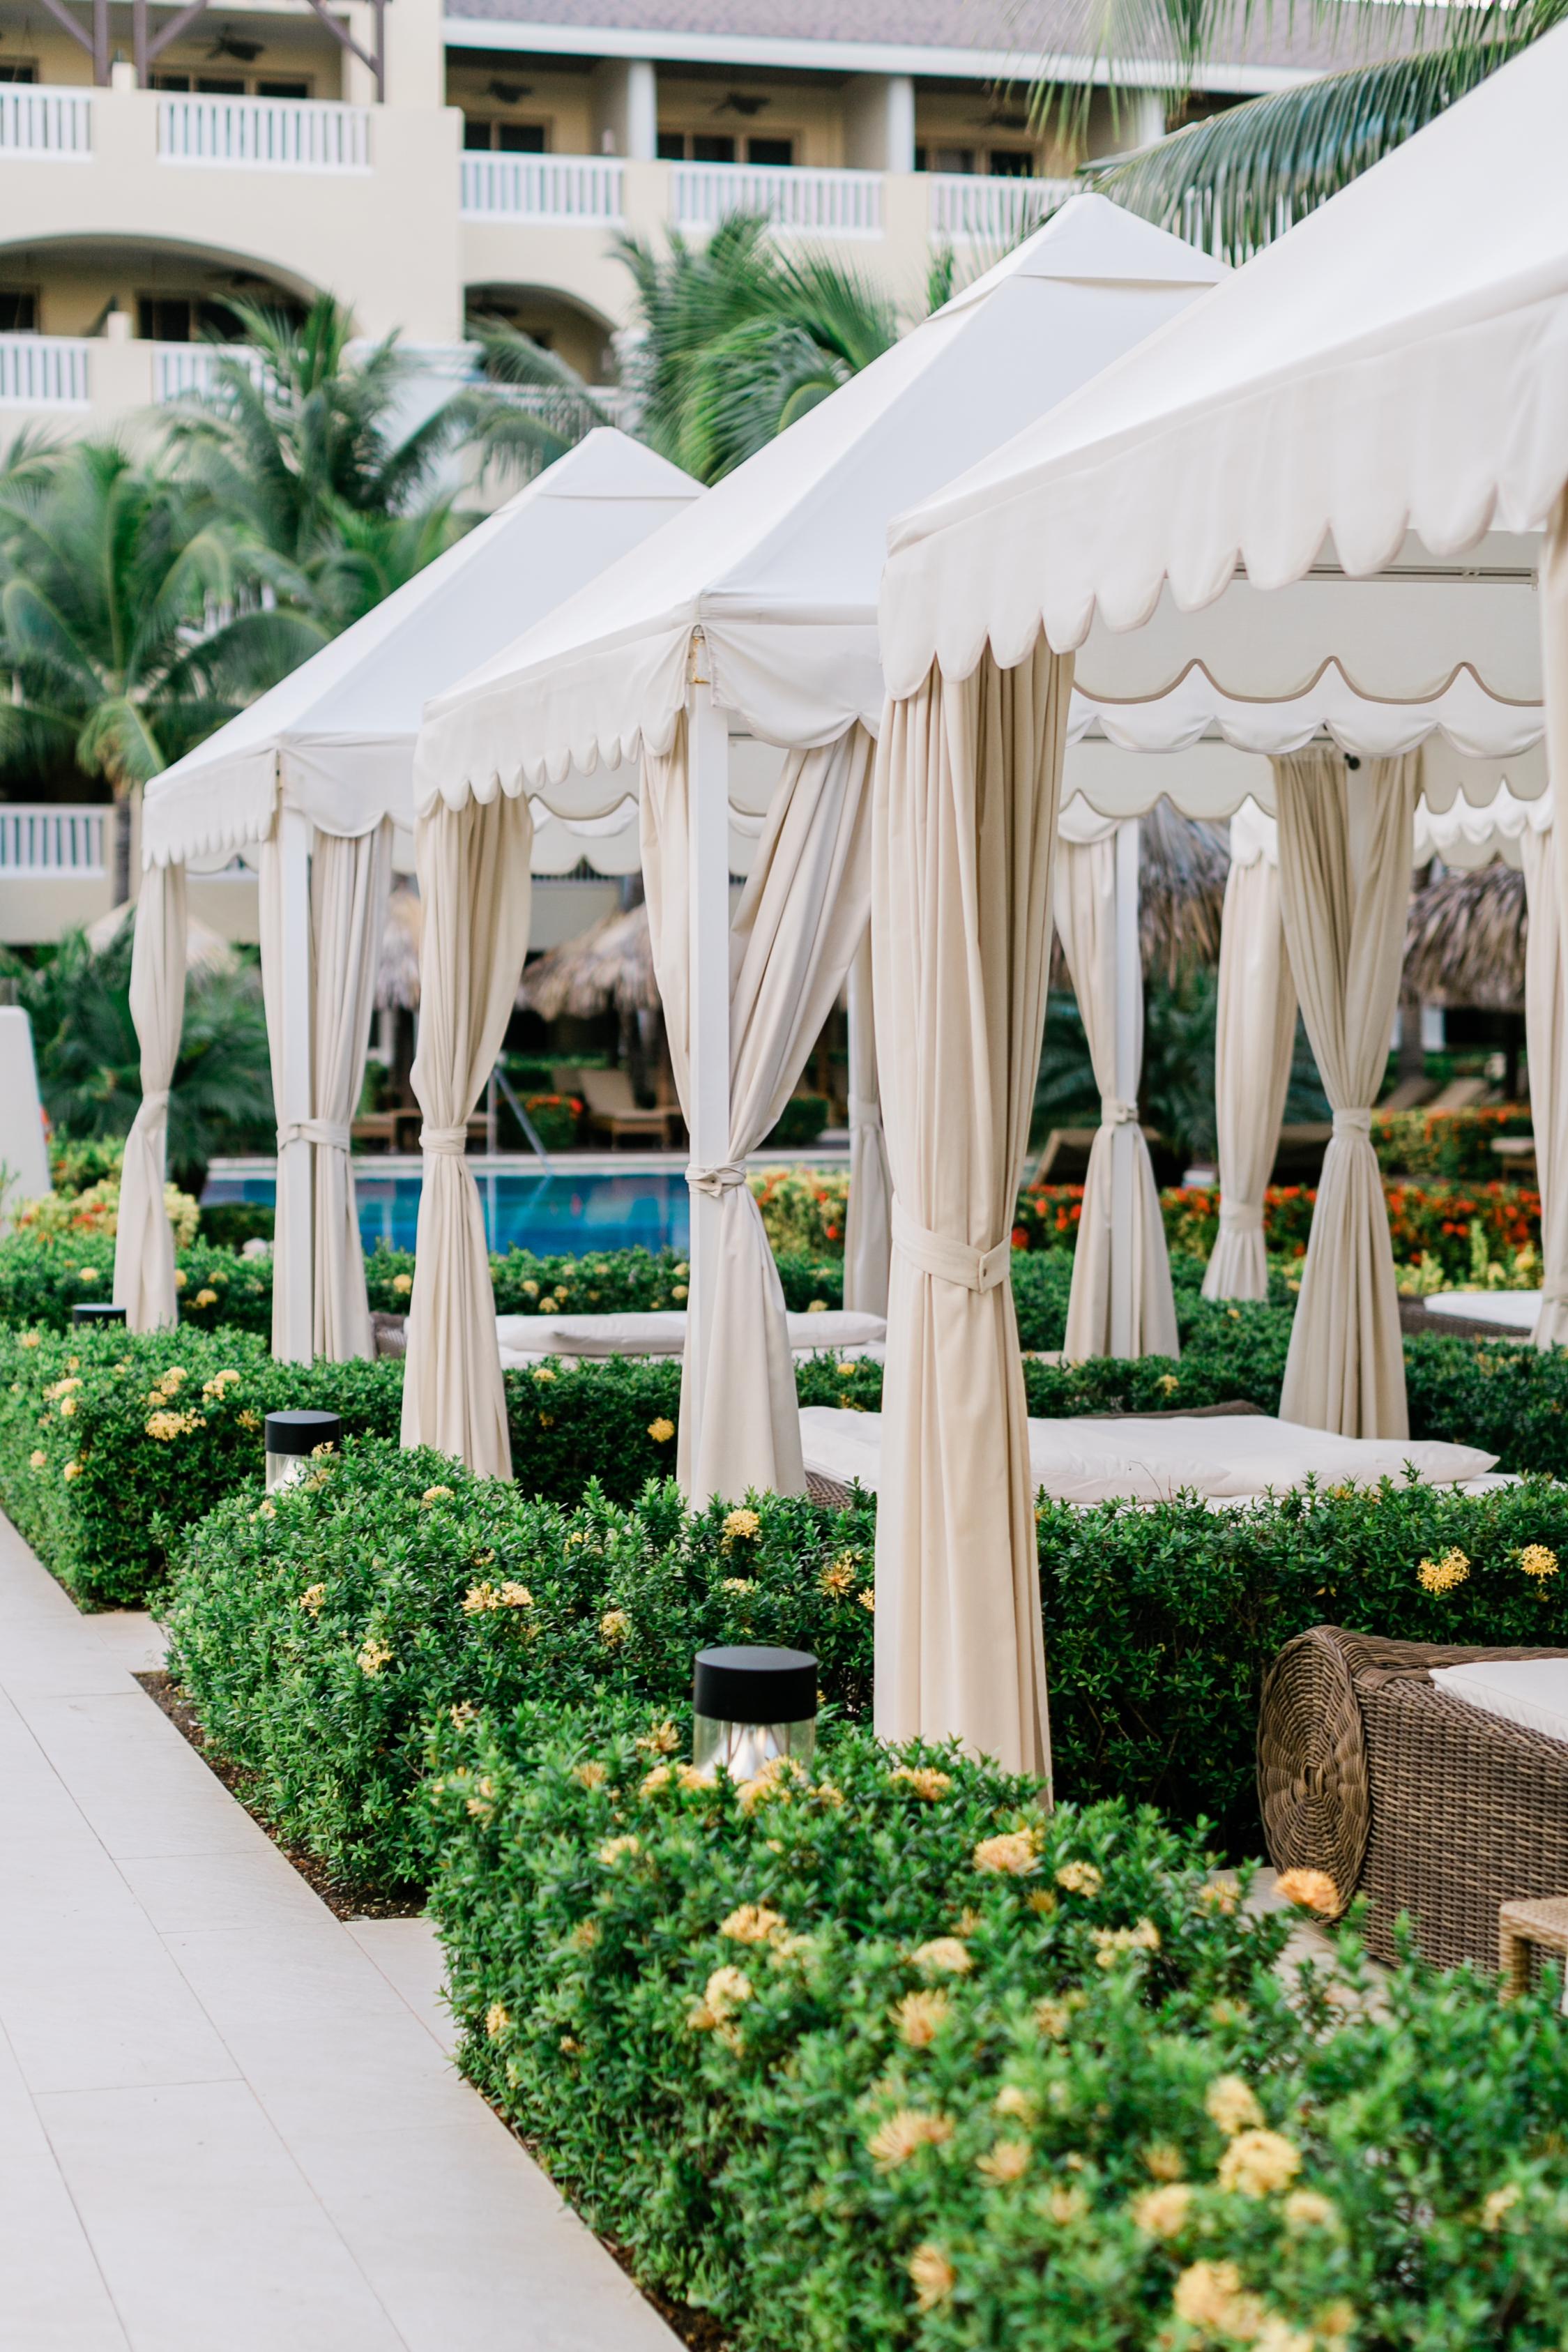 ashergardner-jamaica-wedding-photographer-23.jpg